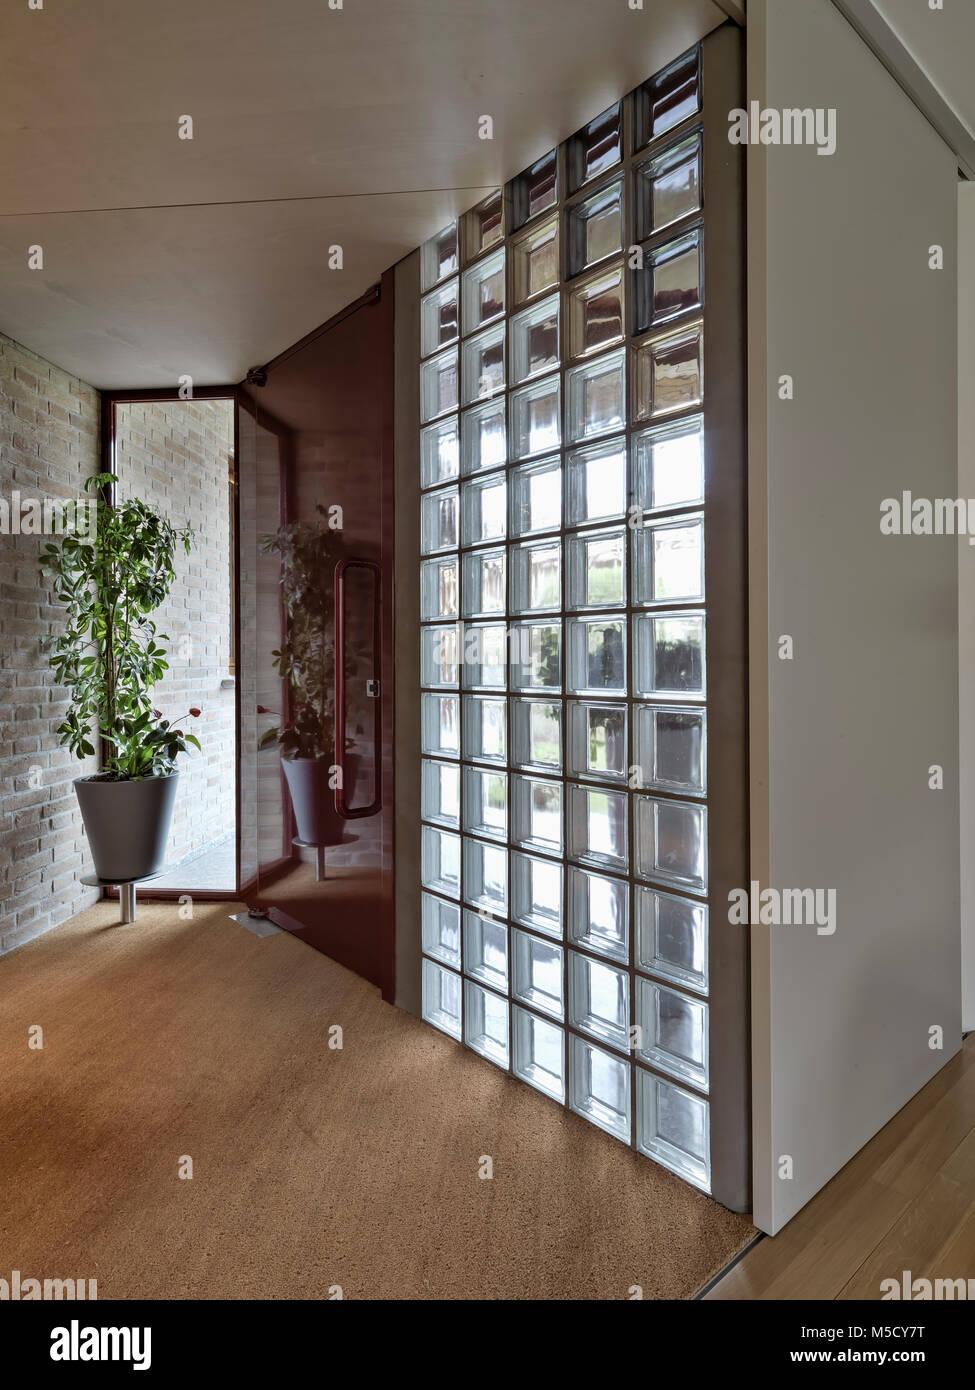 Glass Block Stockfotos & Glass Block Bilder - Alamy